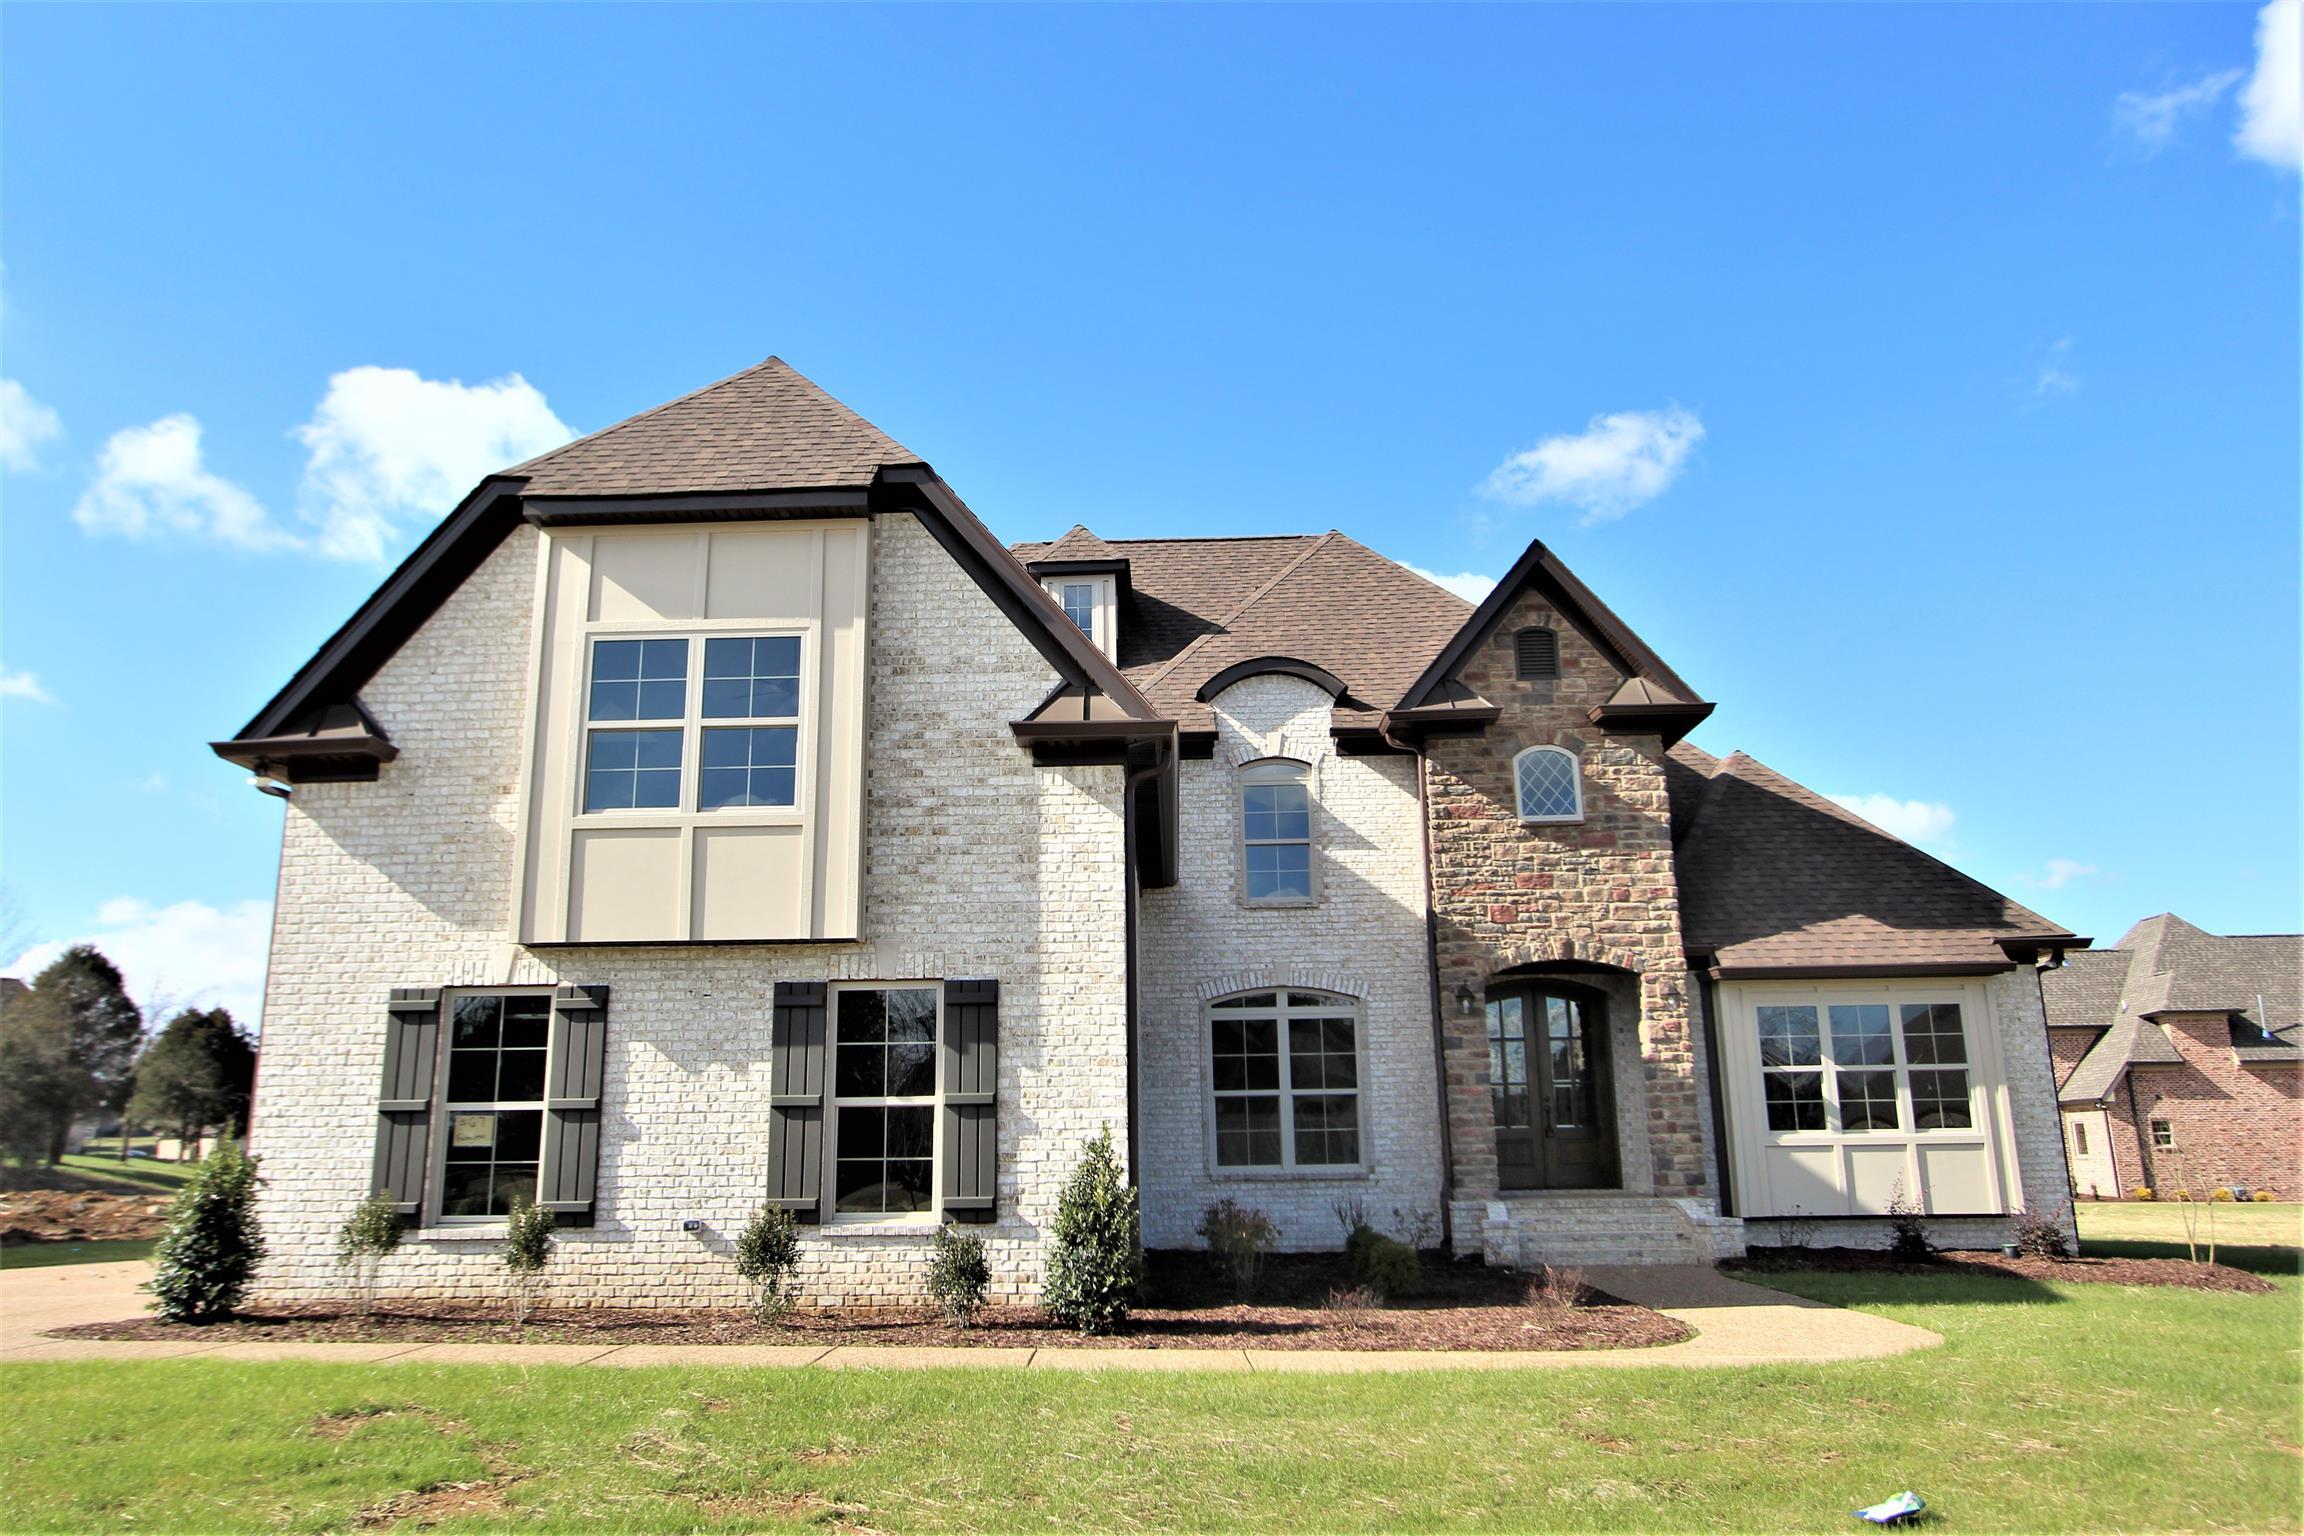 902 Larkspur Lane #67, Lebanon, TN 37087 - Lebanon, TN real estate listing